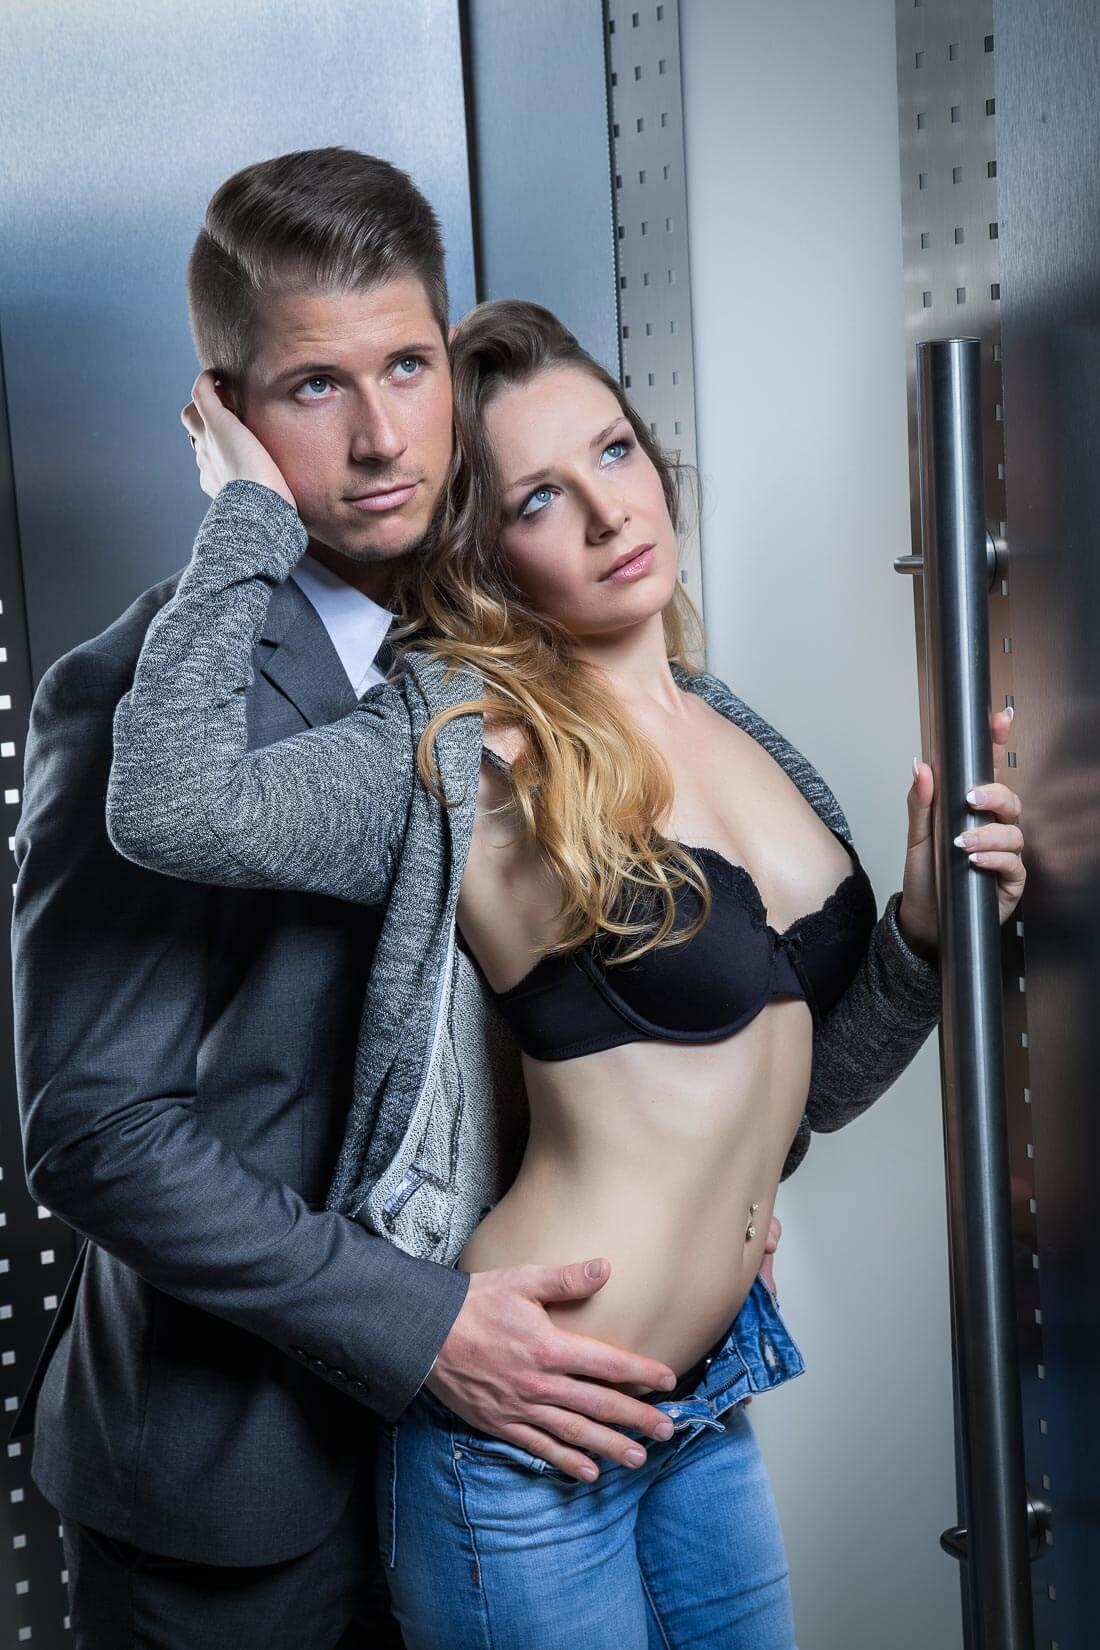 Fotograf-Fotostudio-Dresden-Paar-Shooting-Harmonie-Liebe-Erotik-Augenblicke-Berührungen-Szenen